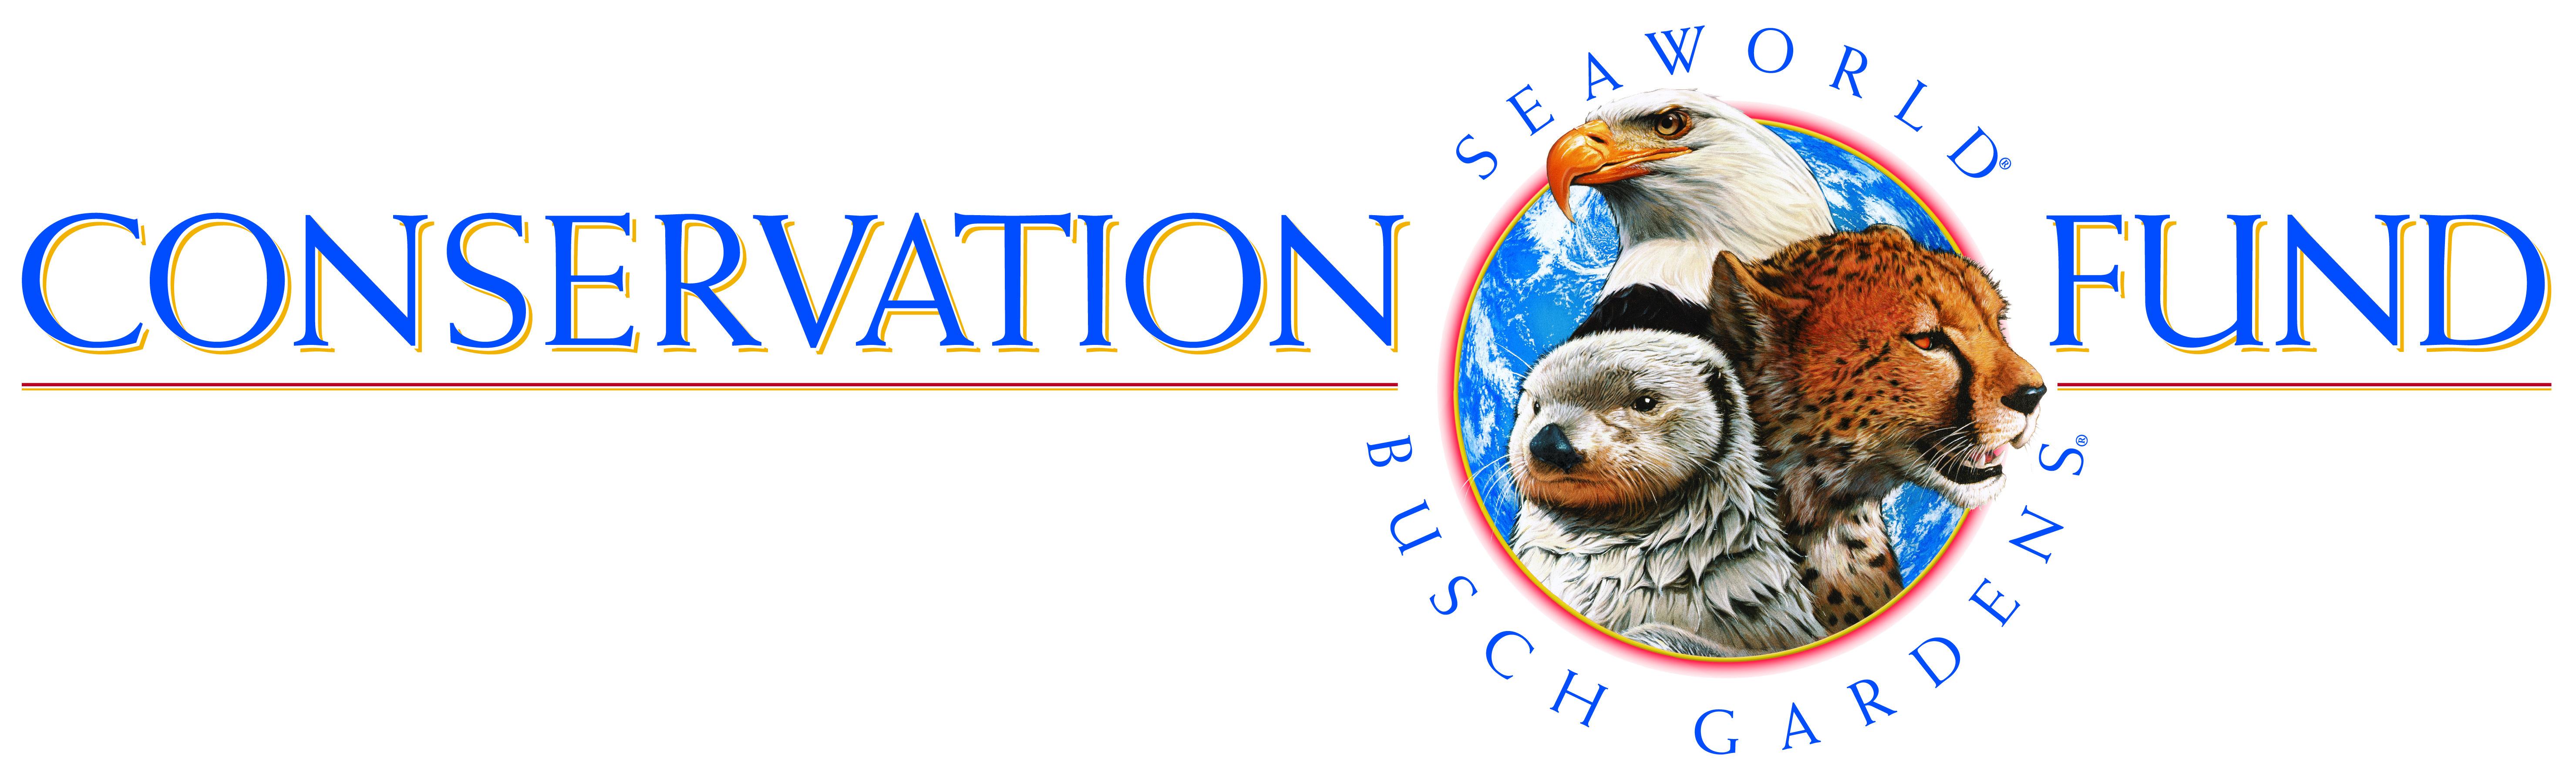 SWBG Conservation Fund Horizontal logo(H